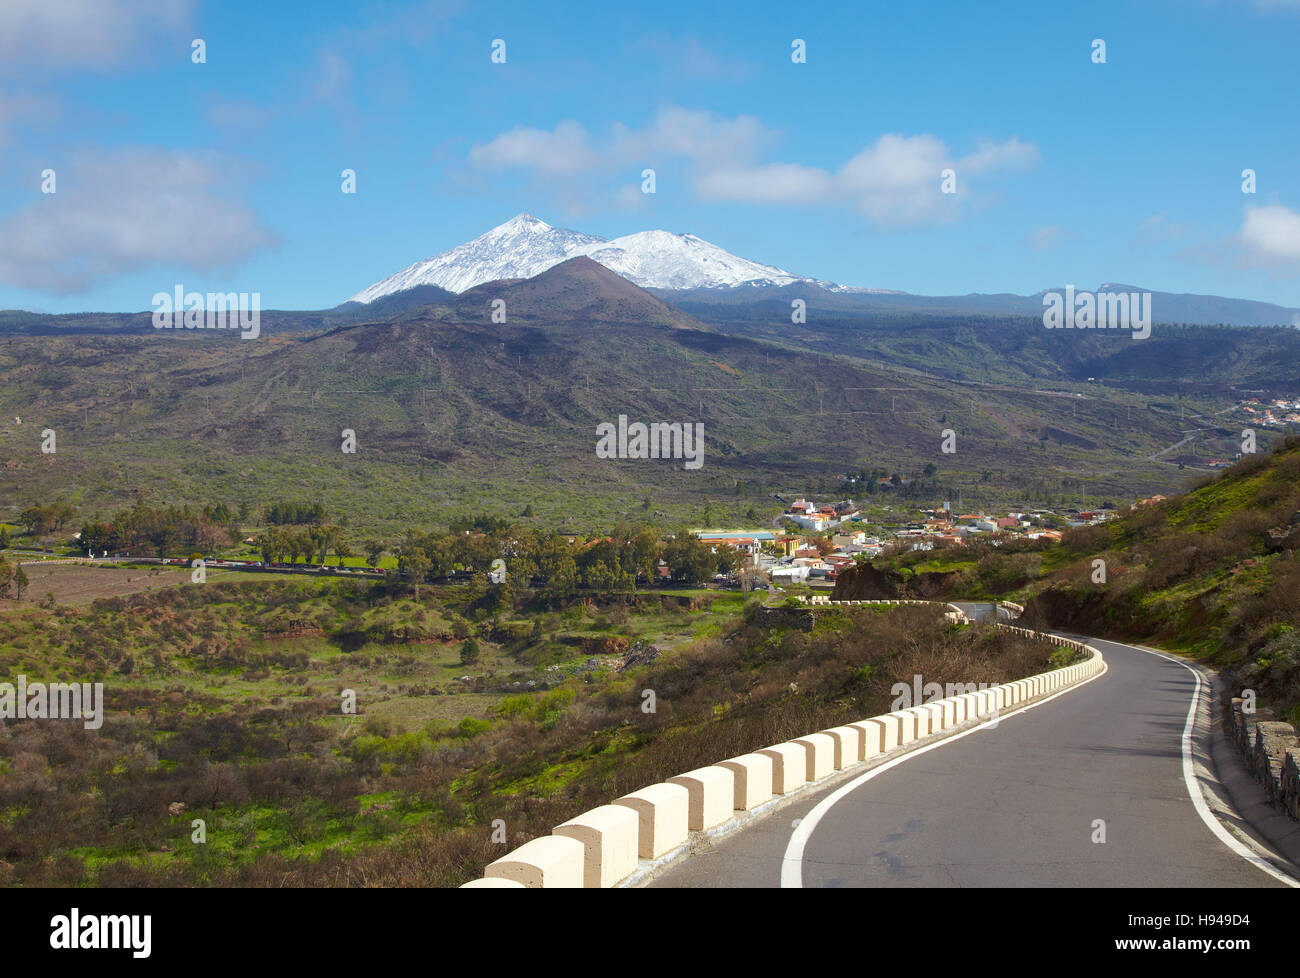 Road to Santiago del Teide, Tenerife, Spain - Stock Image